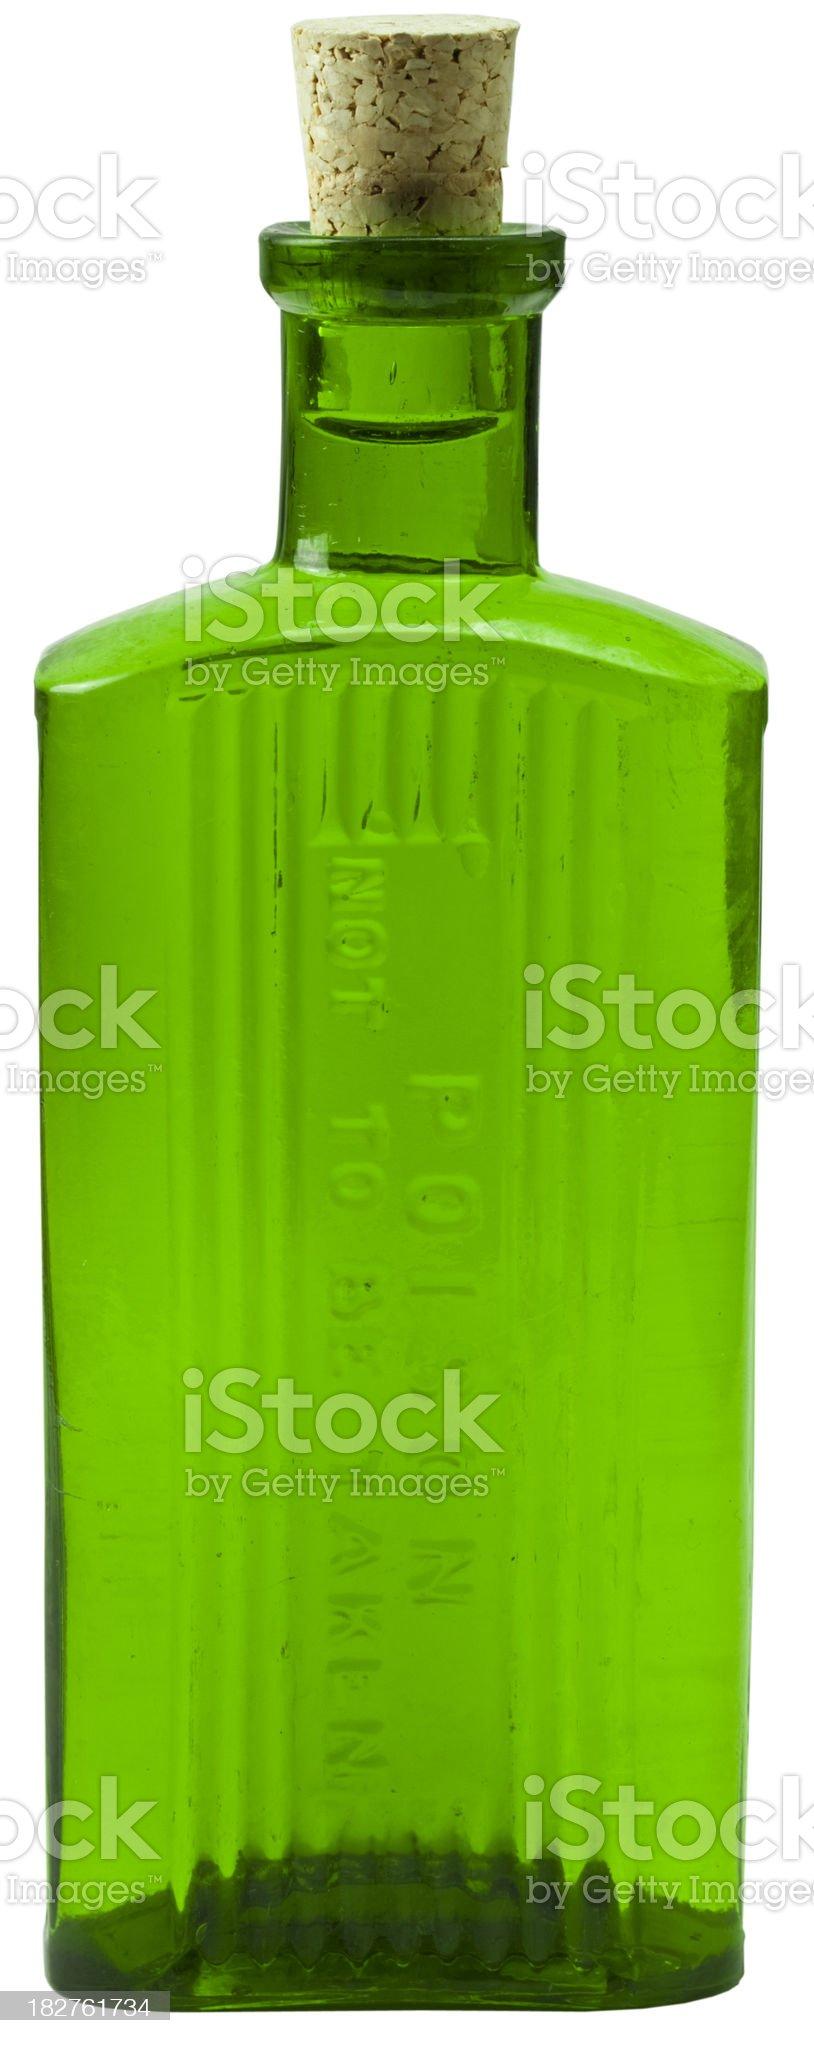 Green Glass Poison Bottle royalty-free stock photo